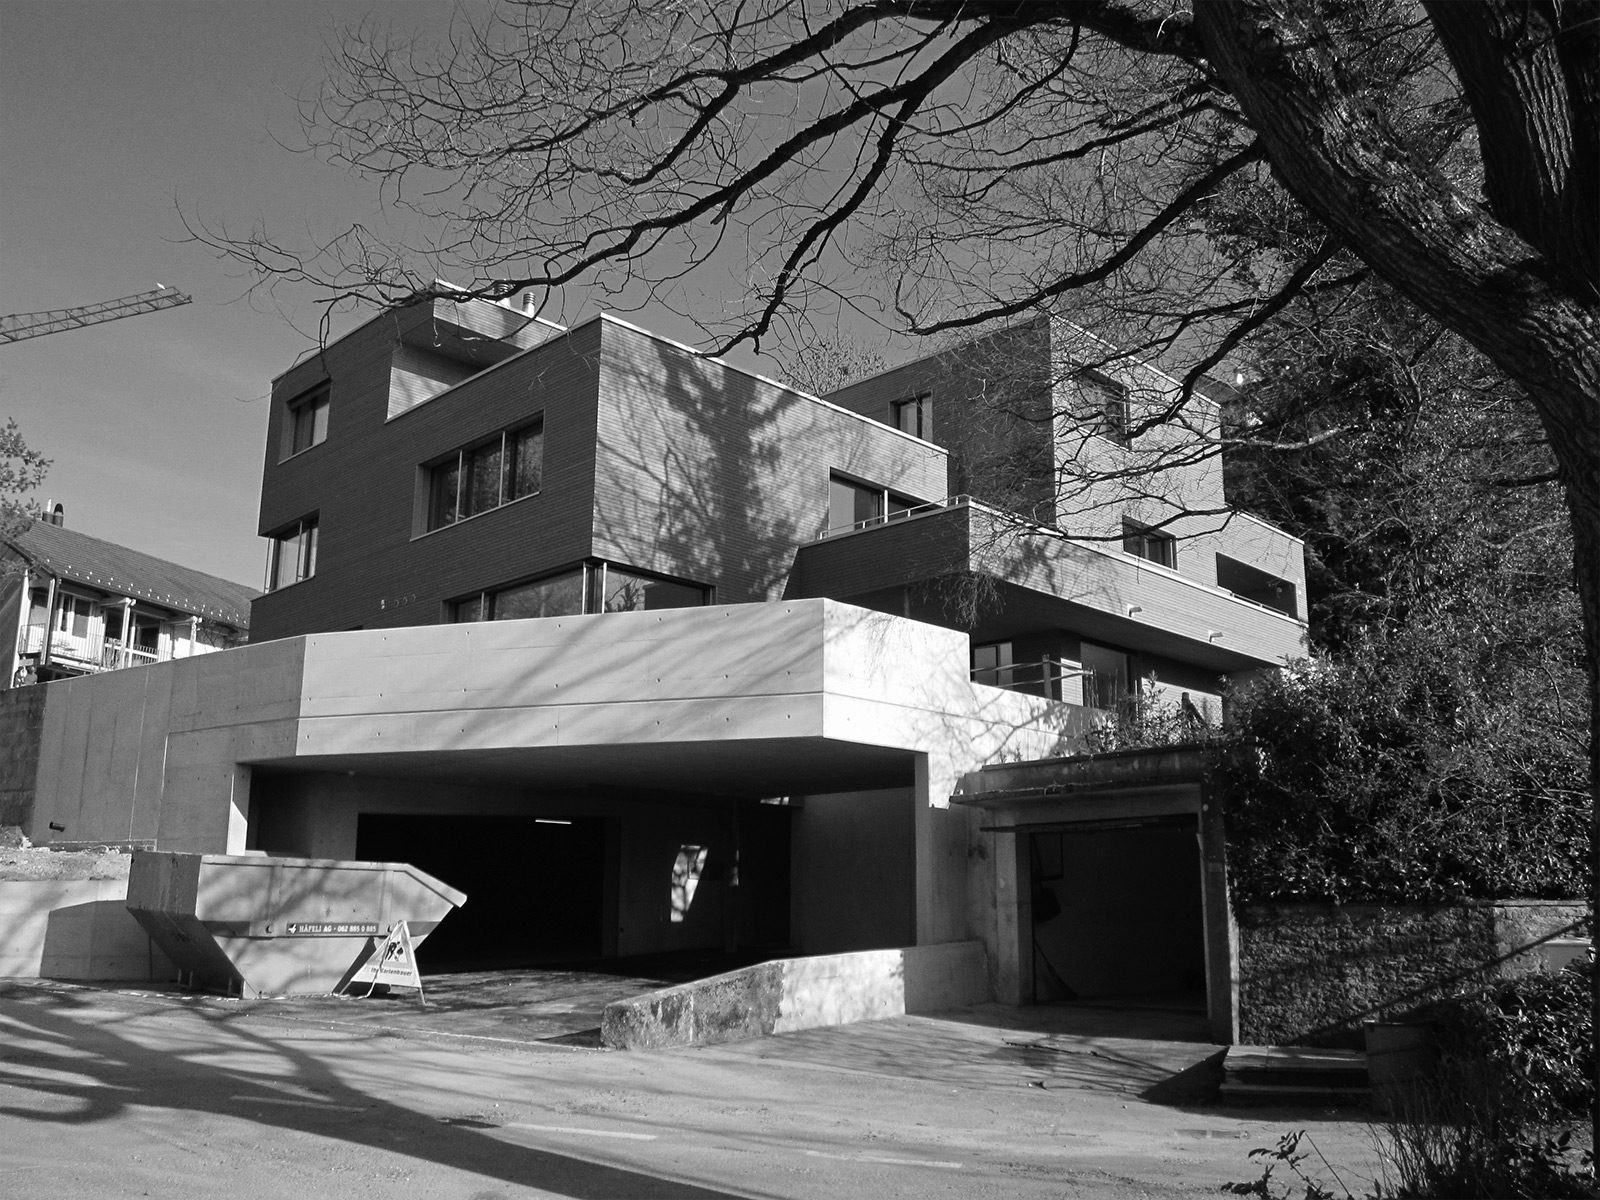 living with a castle view, Brunnmattstrassse, garage entrance